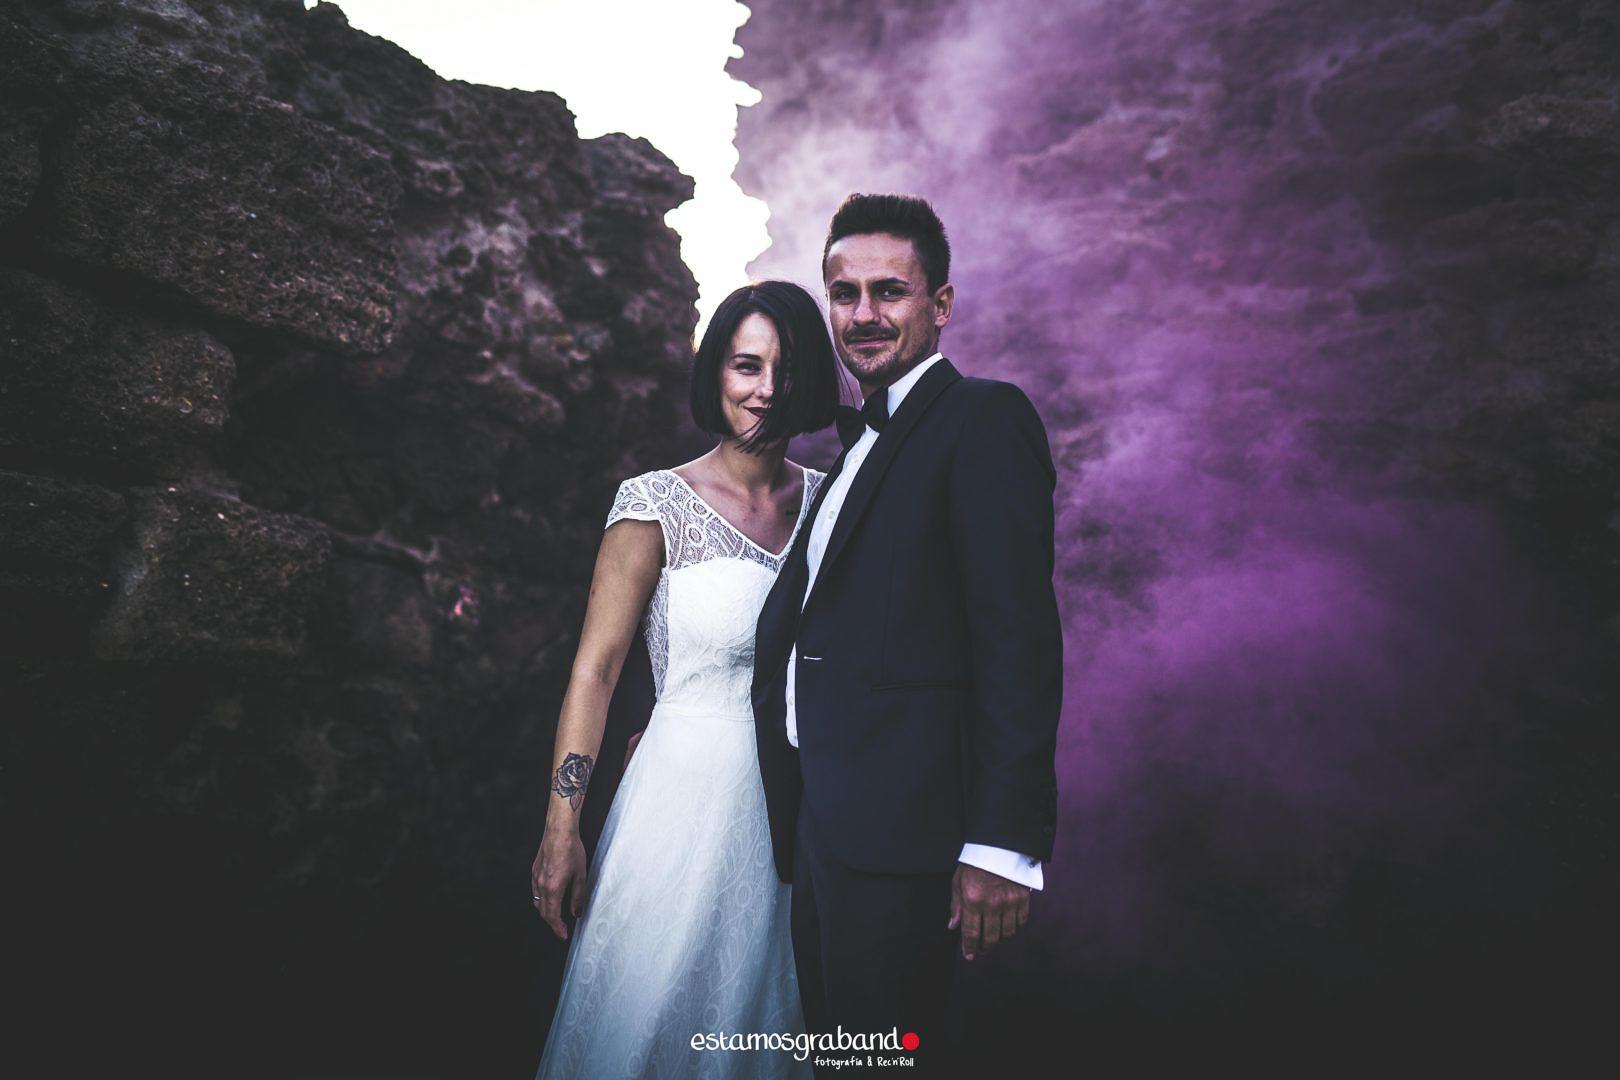 Demo-2017-Fotografía-de-Boda-25 Fotografía de Bodas Recandroller - video boda cadiz